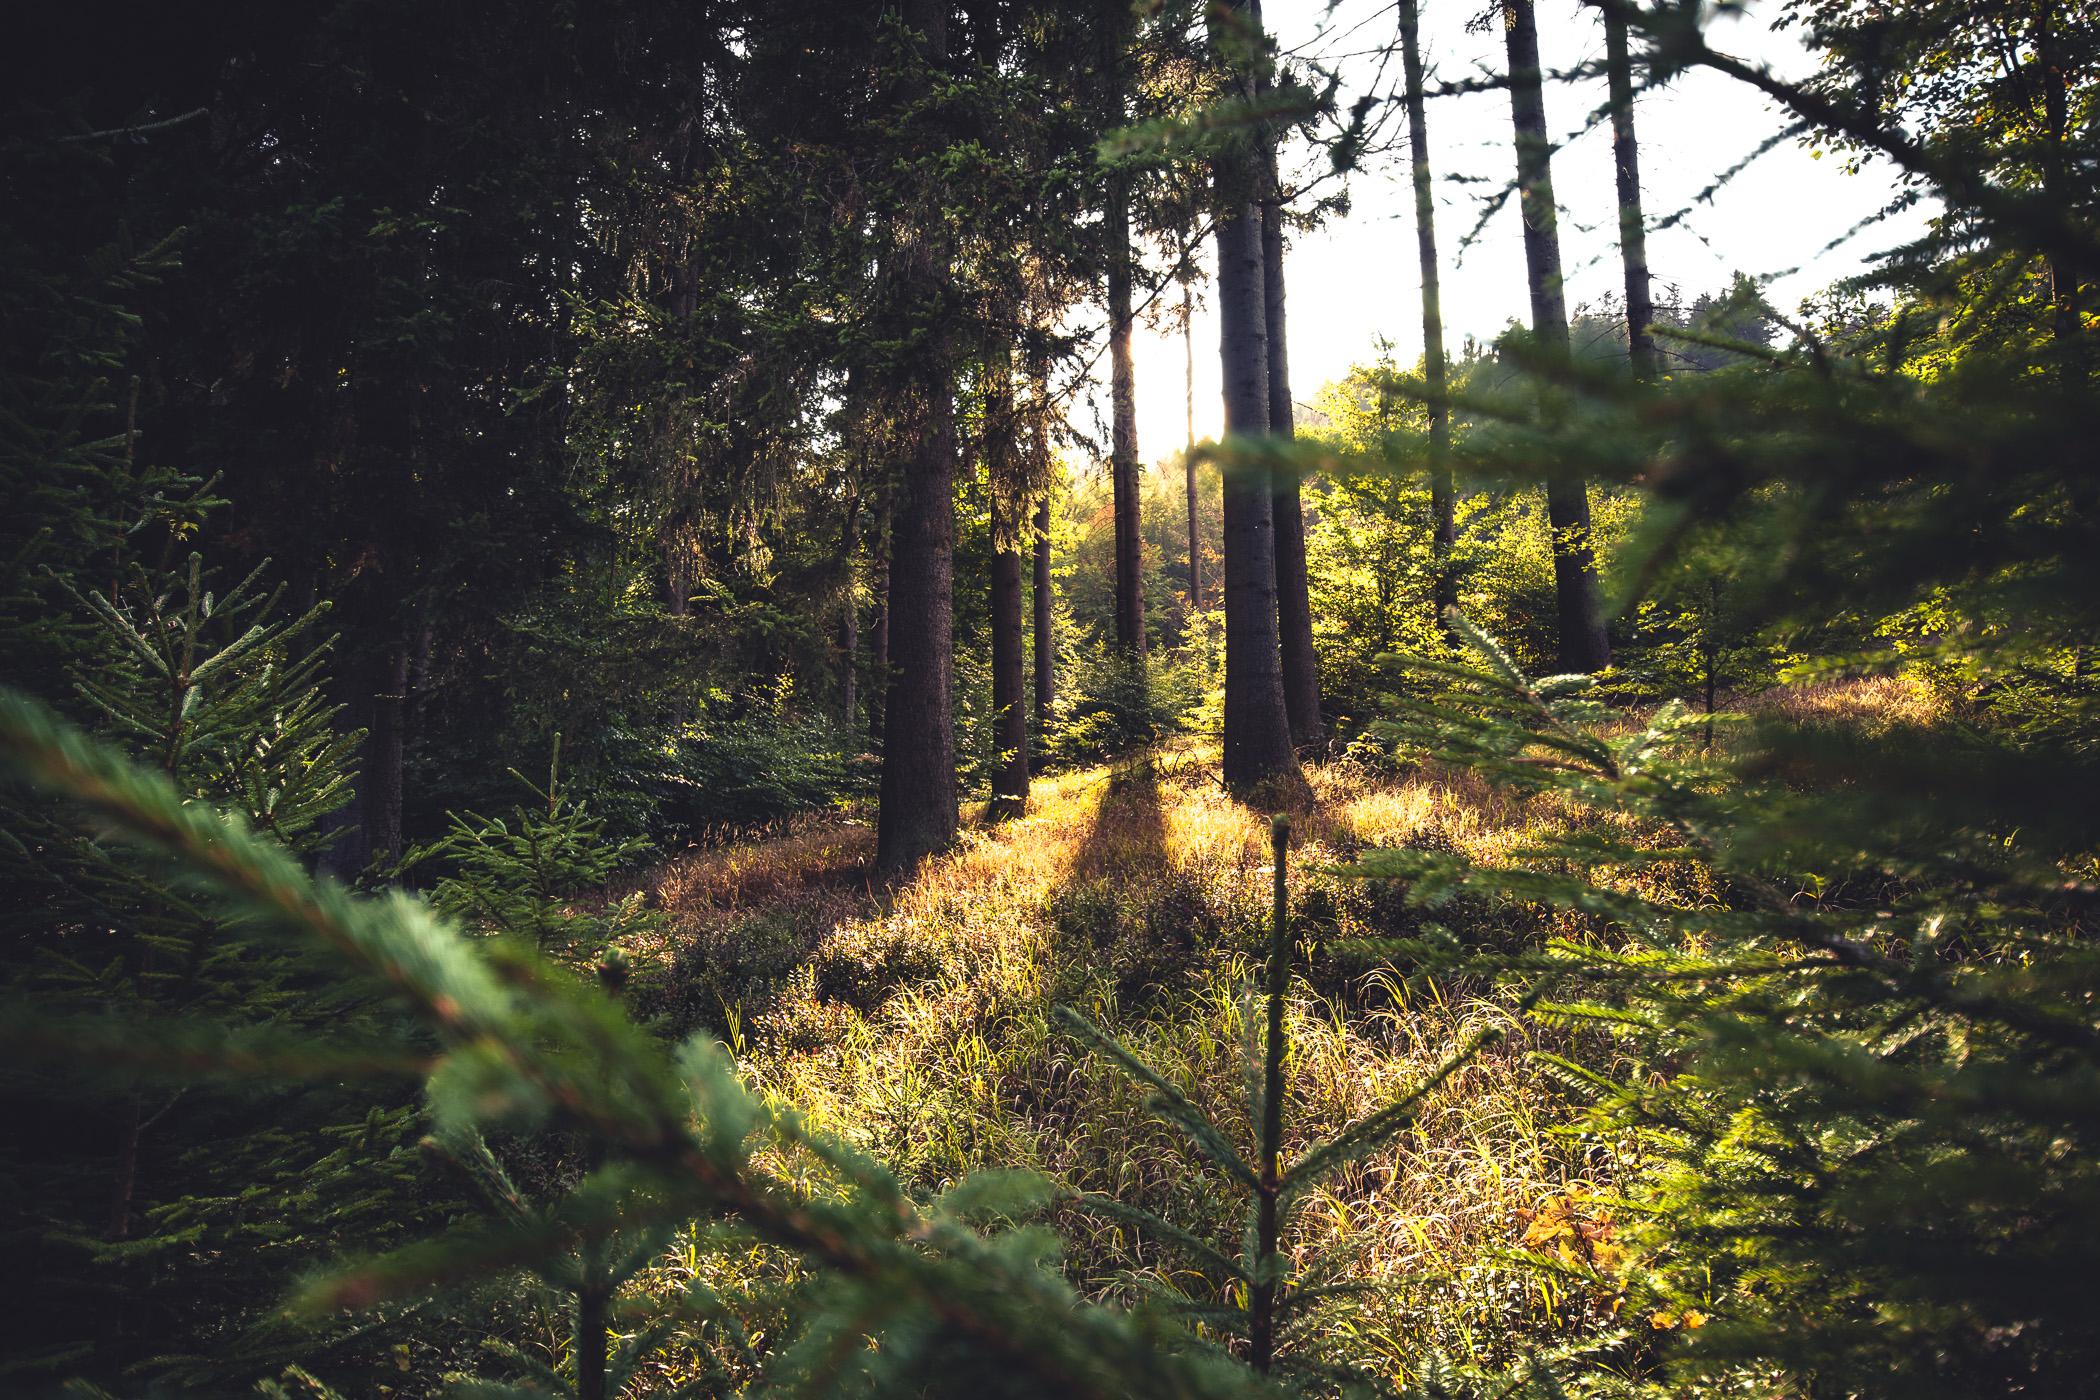 28-09-2018_behind_the_tree_Orlicke_hory_sq.jpg